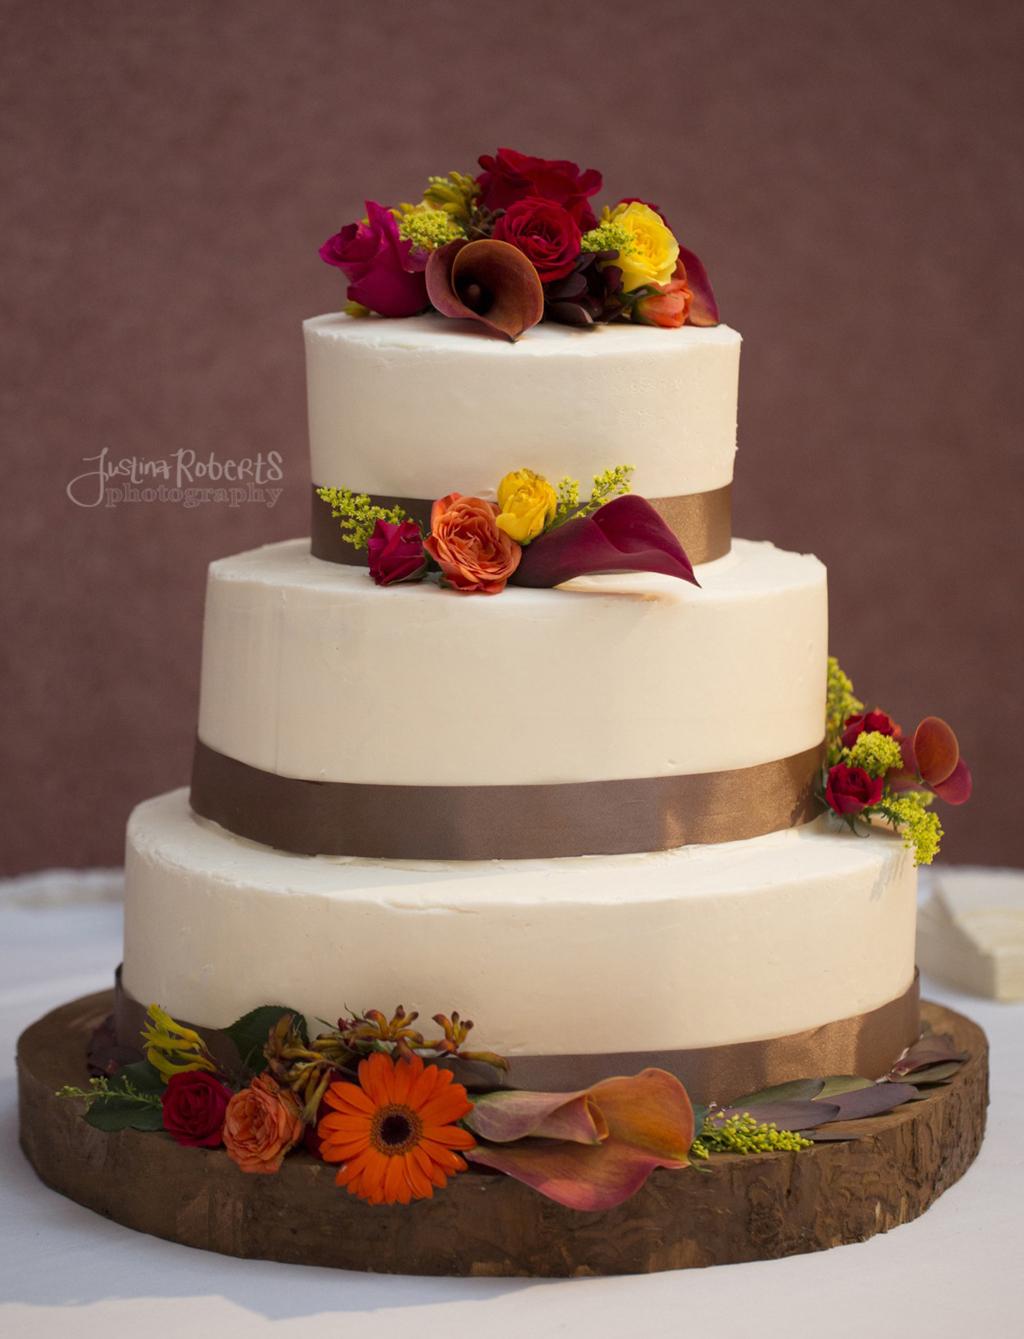 1b0f0e885cf95417-008_vermilion-ohio-wedding_JustinaRoberts.jpg